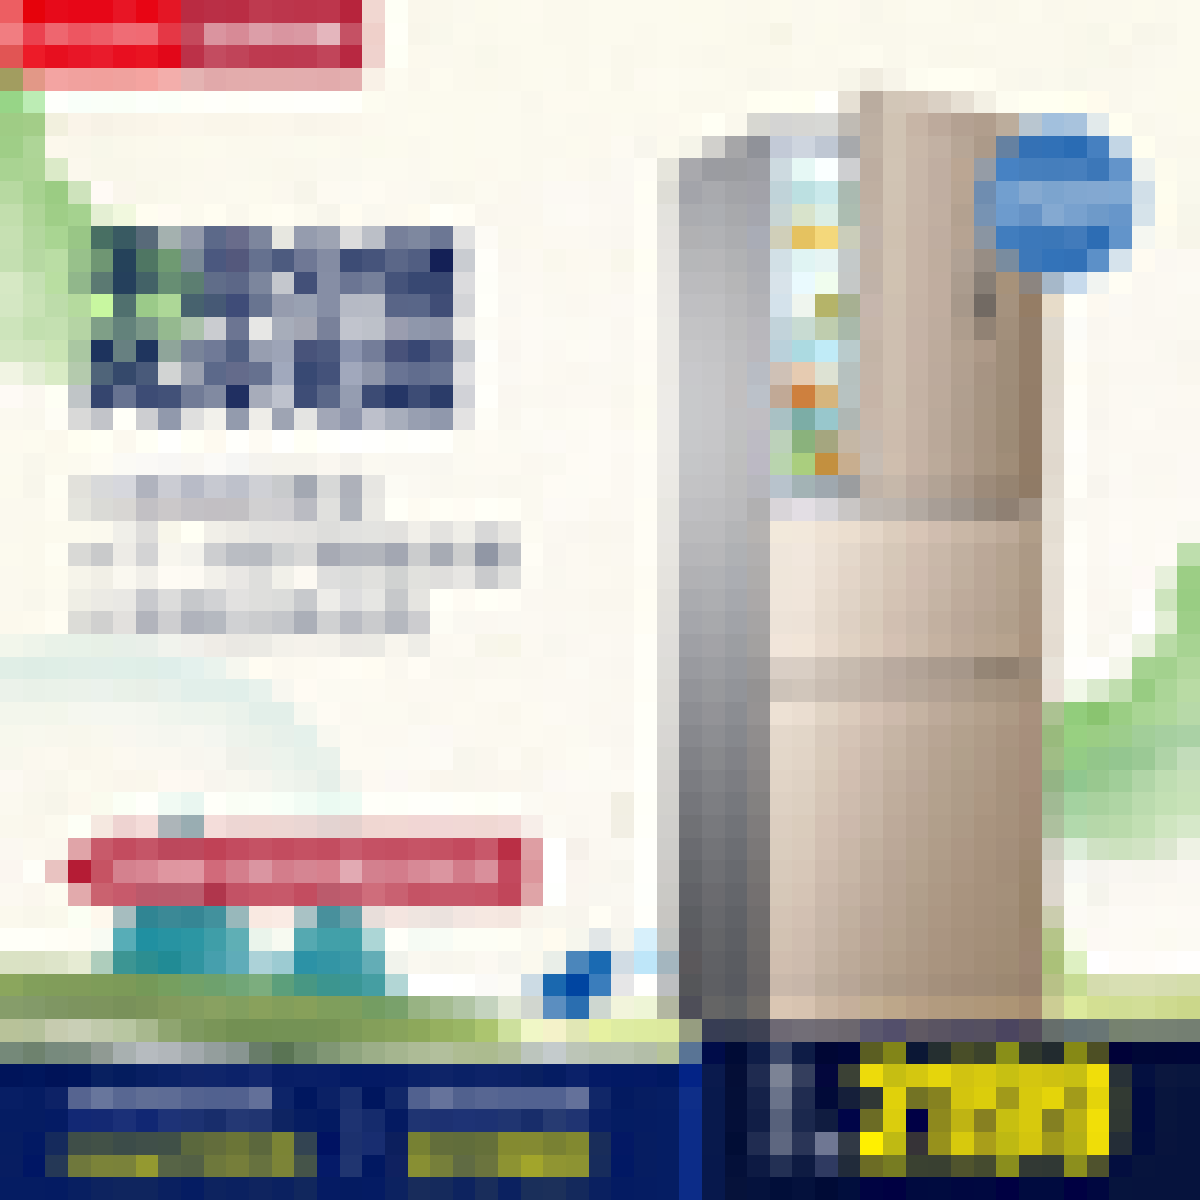 Leader/统帅 冰箱 BCD-258WLDEBU1